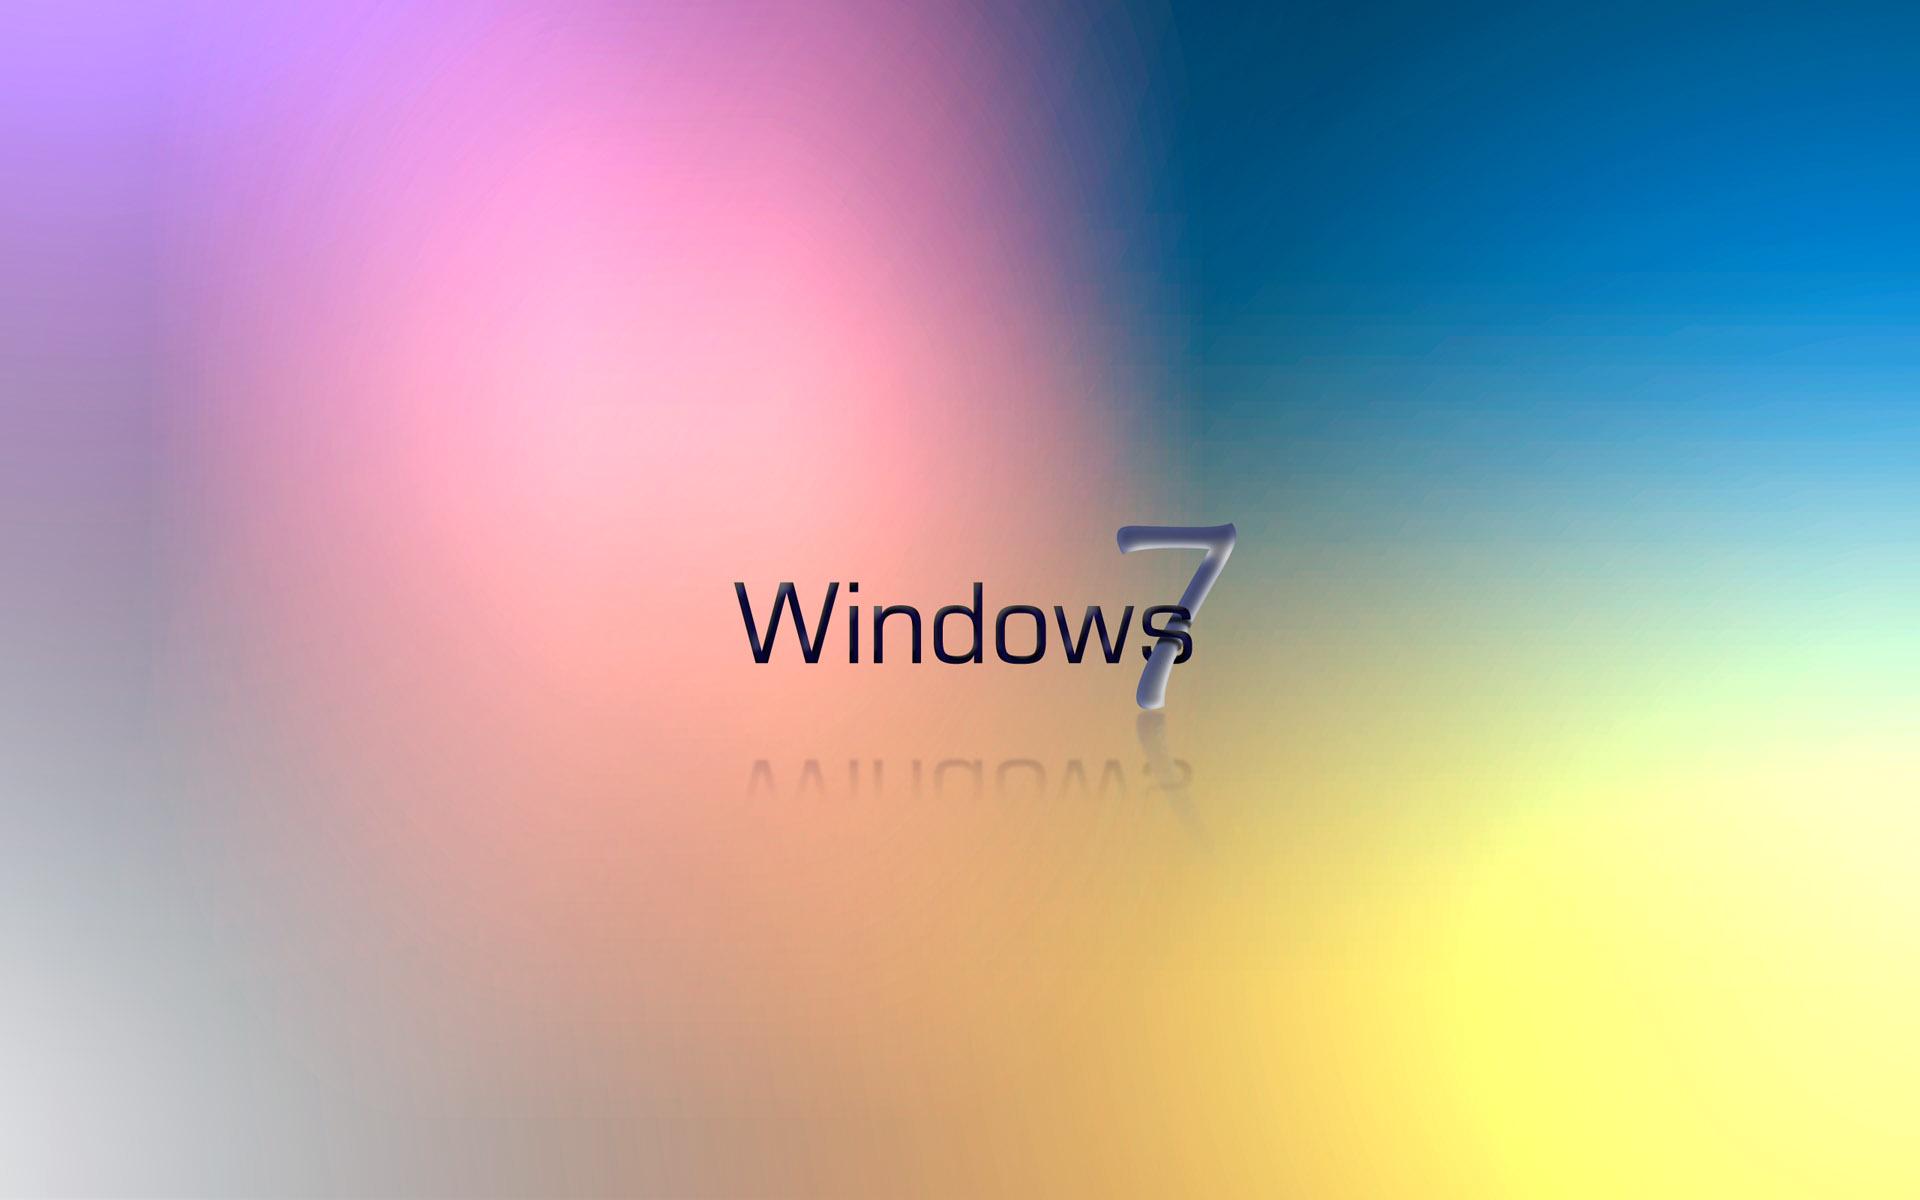 Windows Desktop Wallpaper - Background Windows 7 Professional - HD Wallpaper